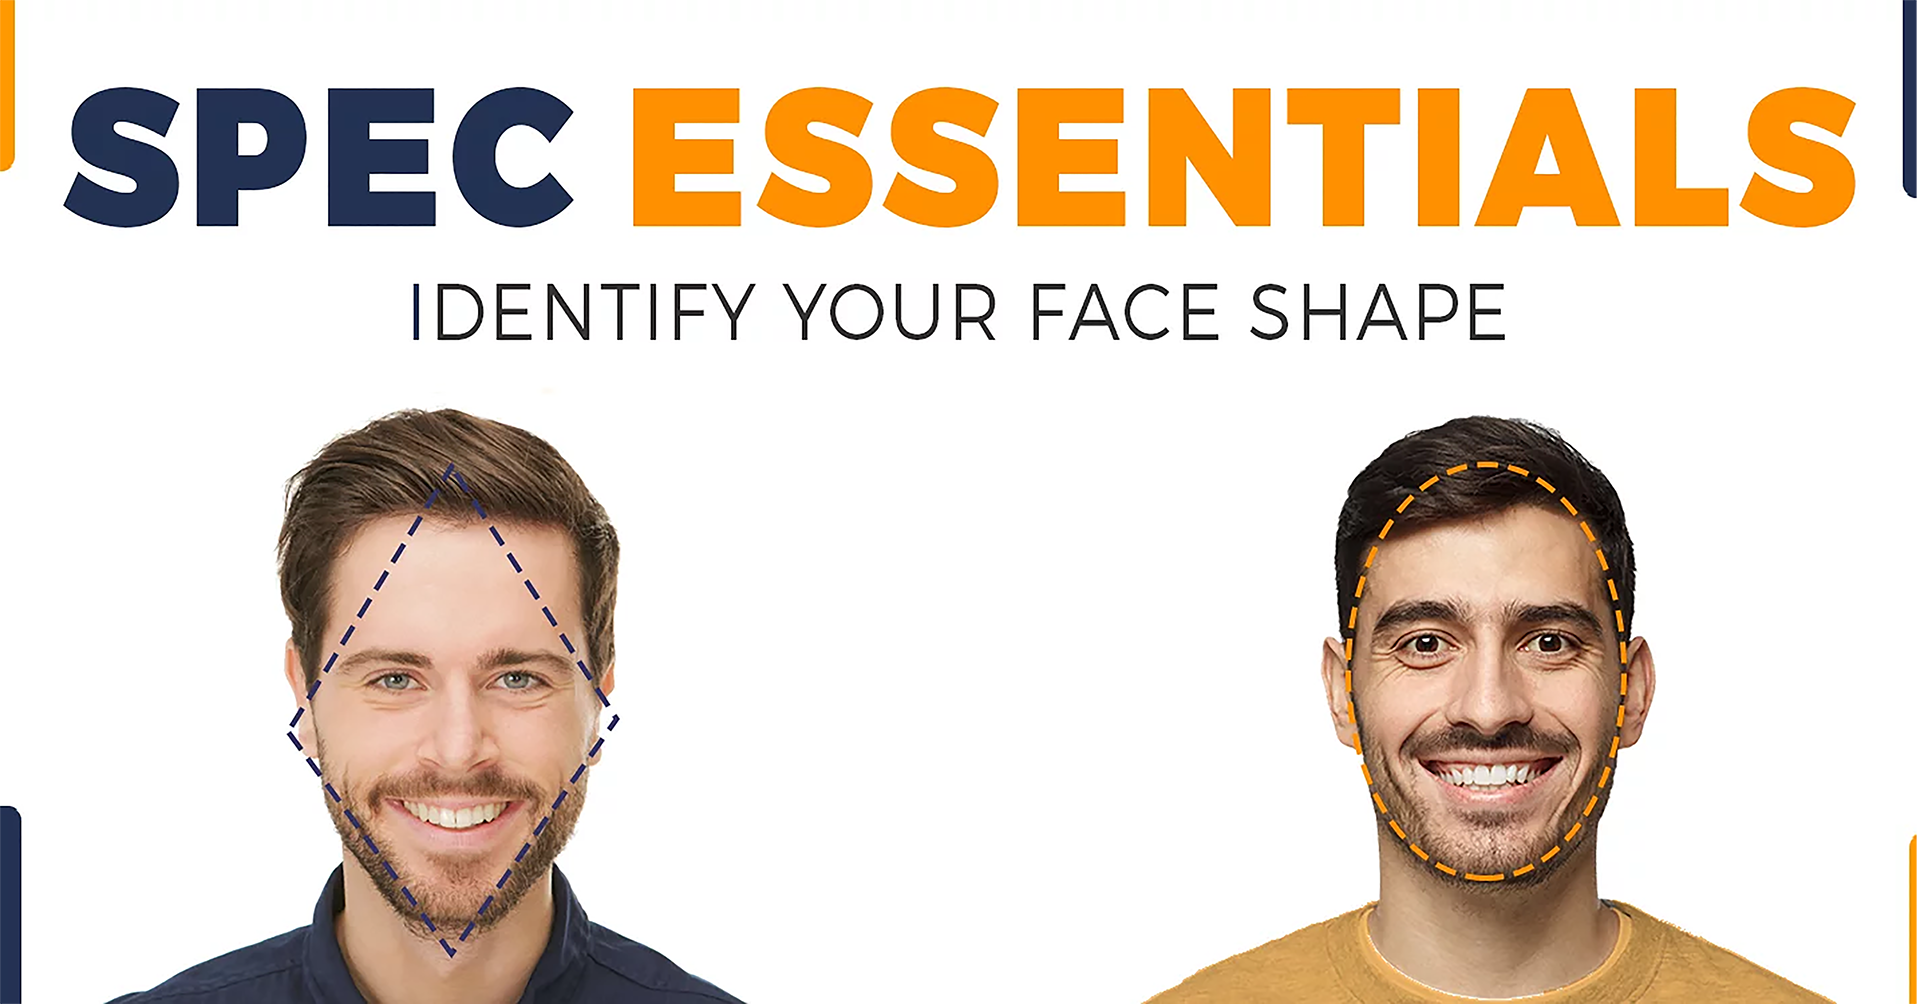 1)SPEC ESSENTIALS: IDENTIFY YOUR FACE SHAPE